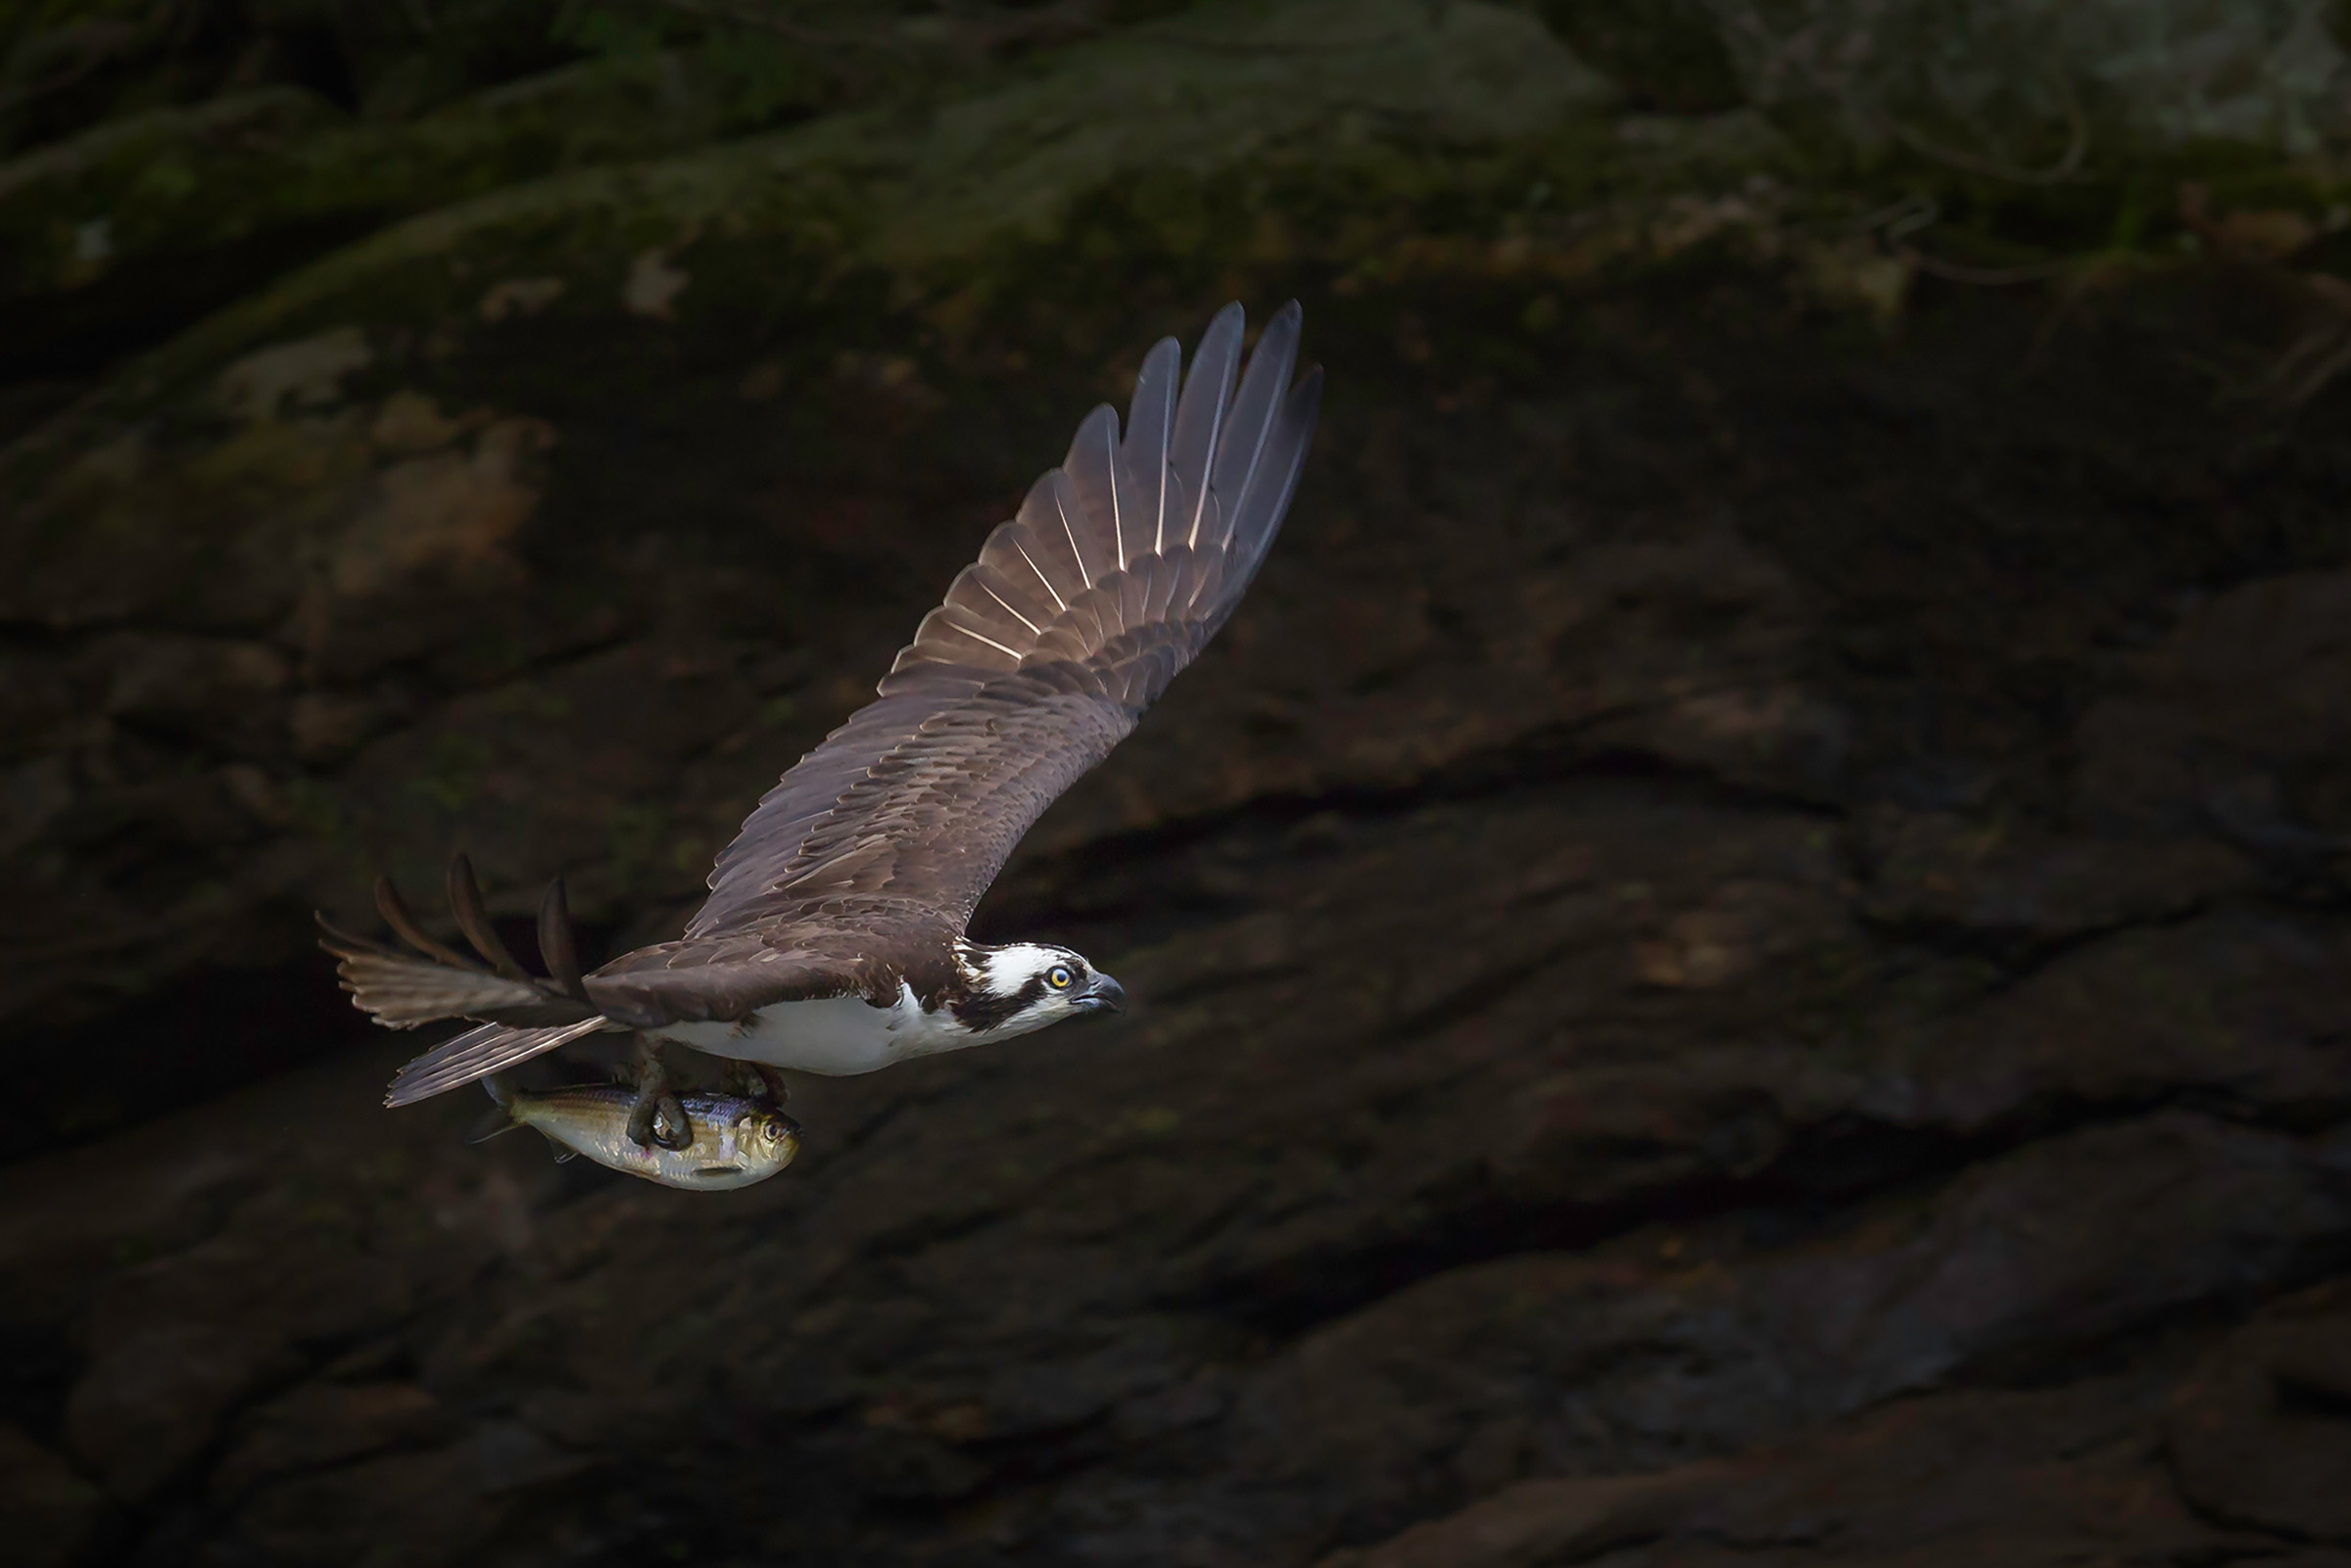 An Osprey with a menhaden fish. Caroline Samson/Audubon Photography Awards